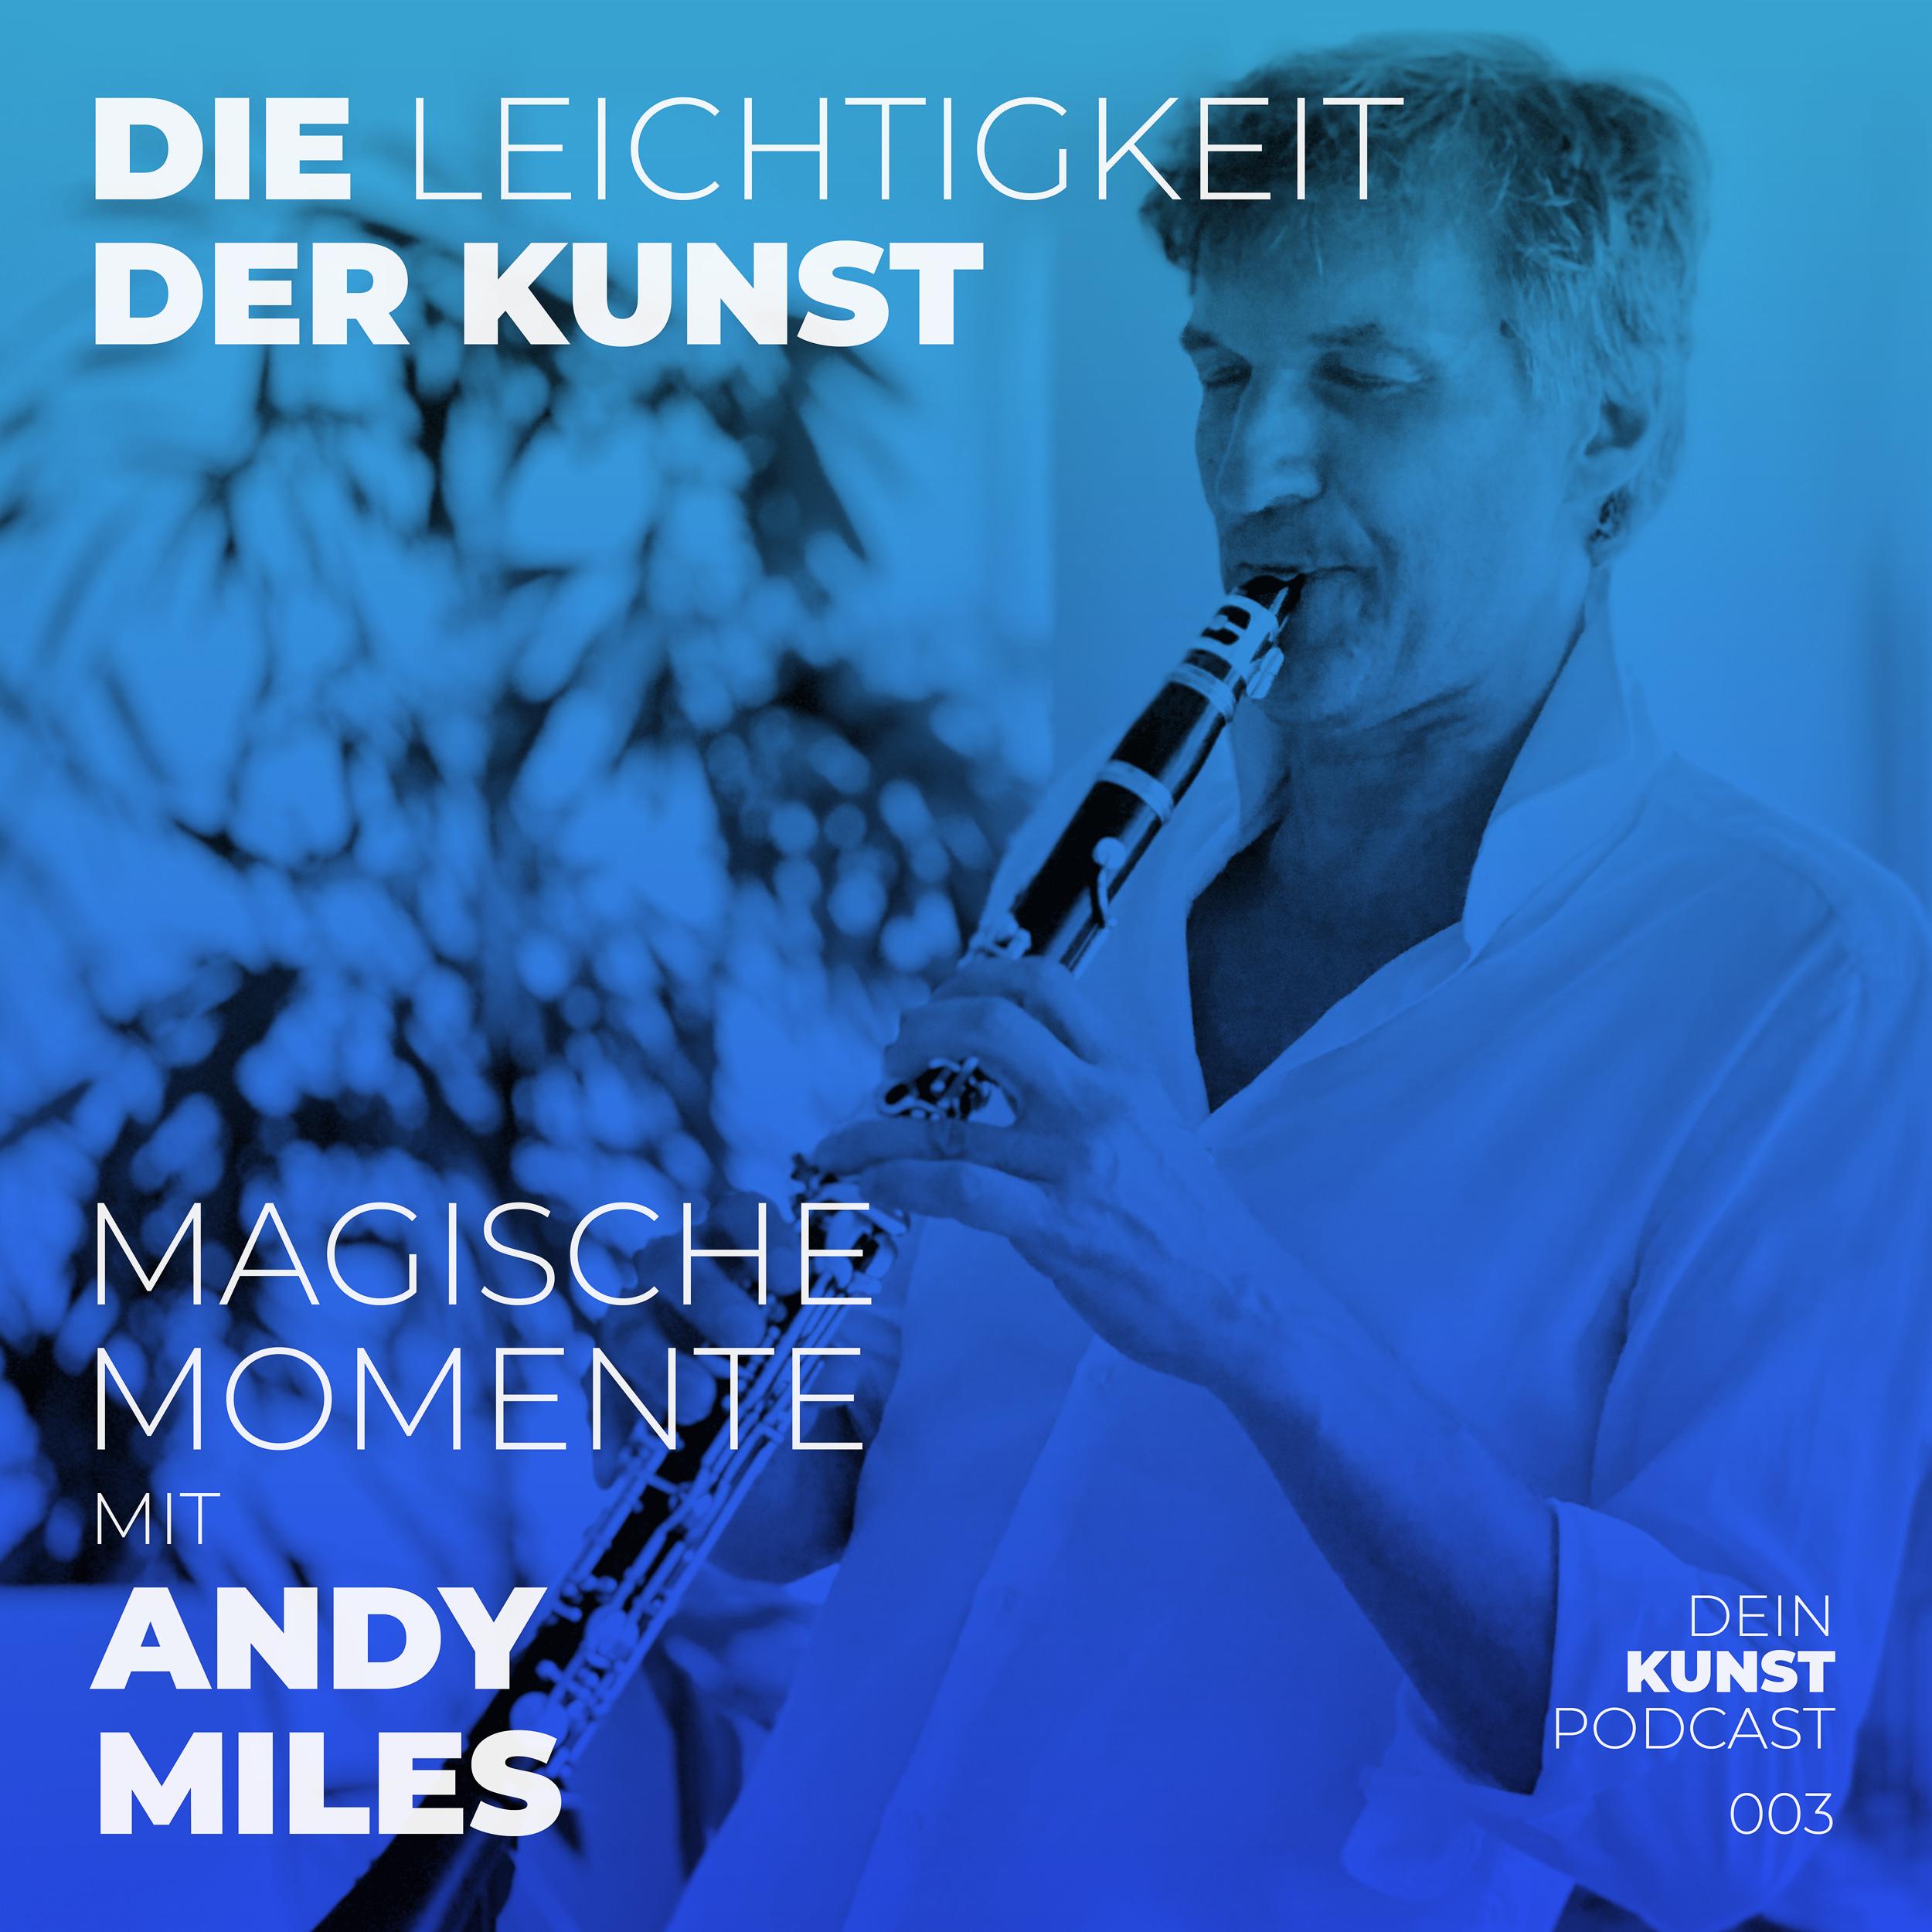 Magische Momente mit Andy Miles